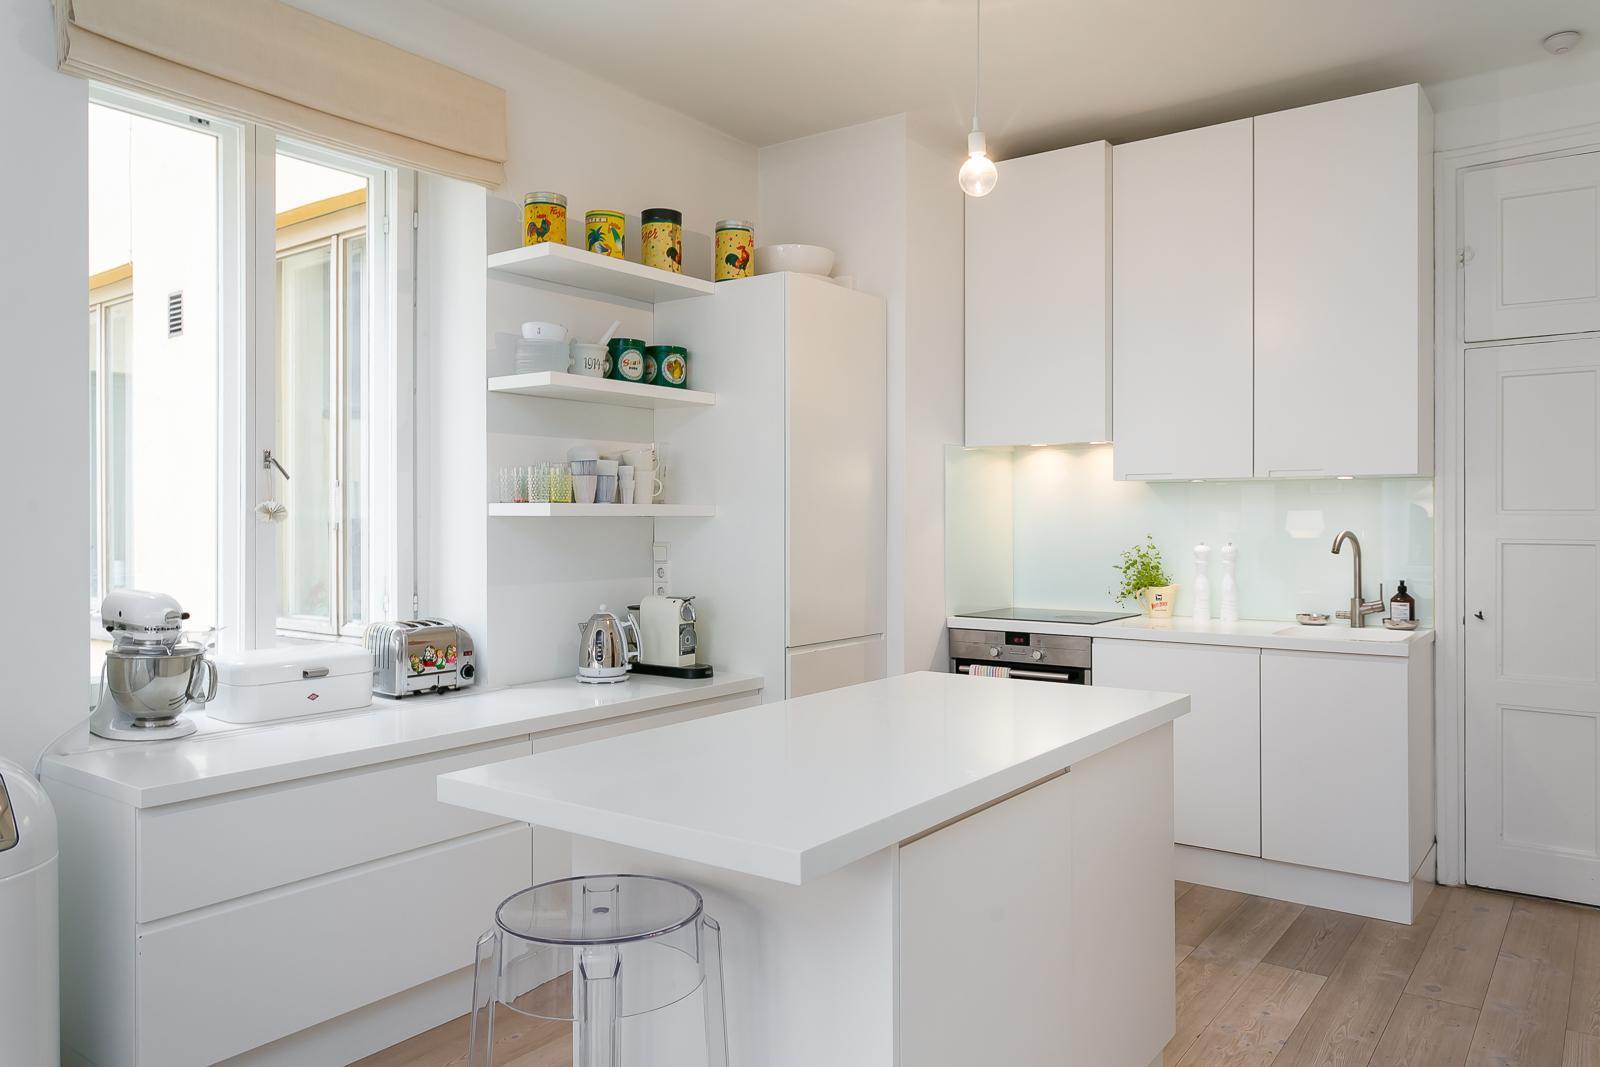 Moderni keittiö  Etuovi com Ideat & vinkit